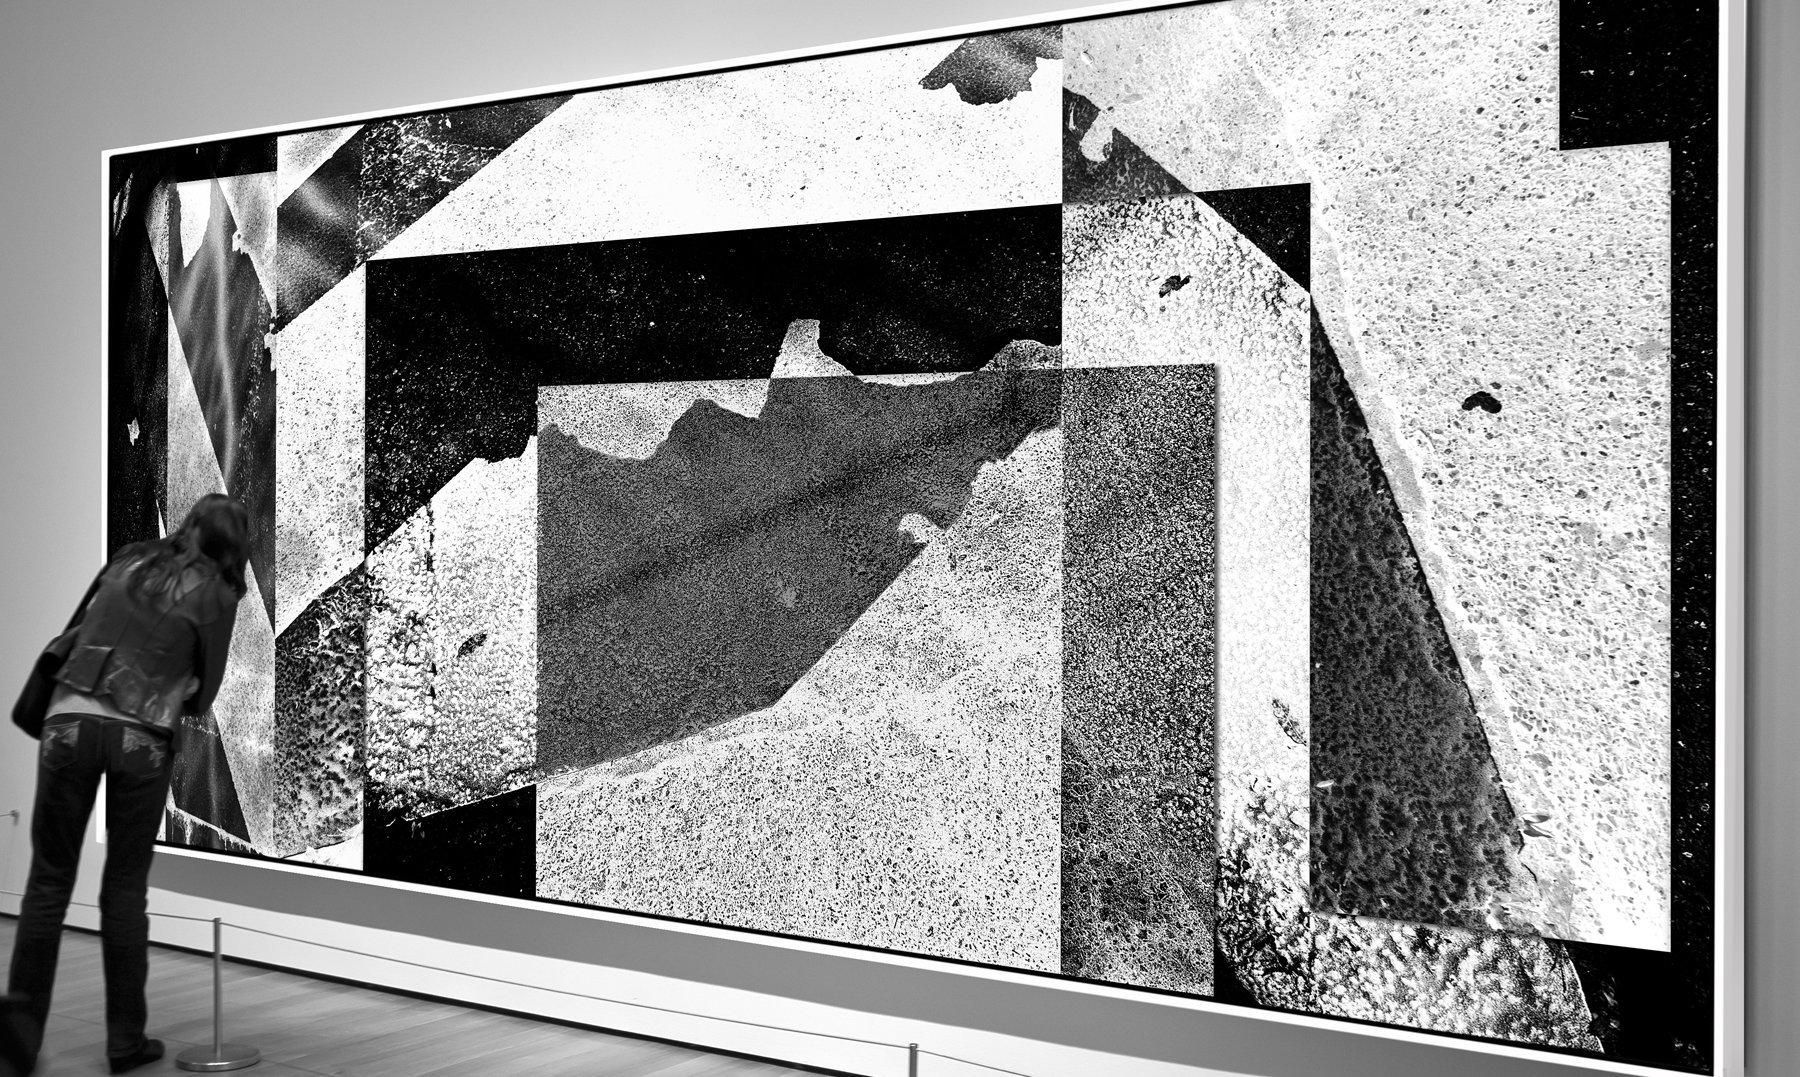 MOMA-067.jpg